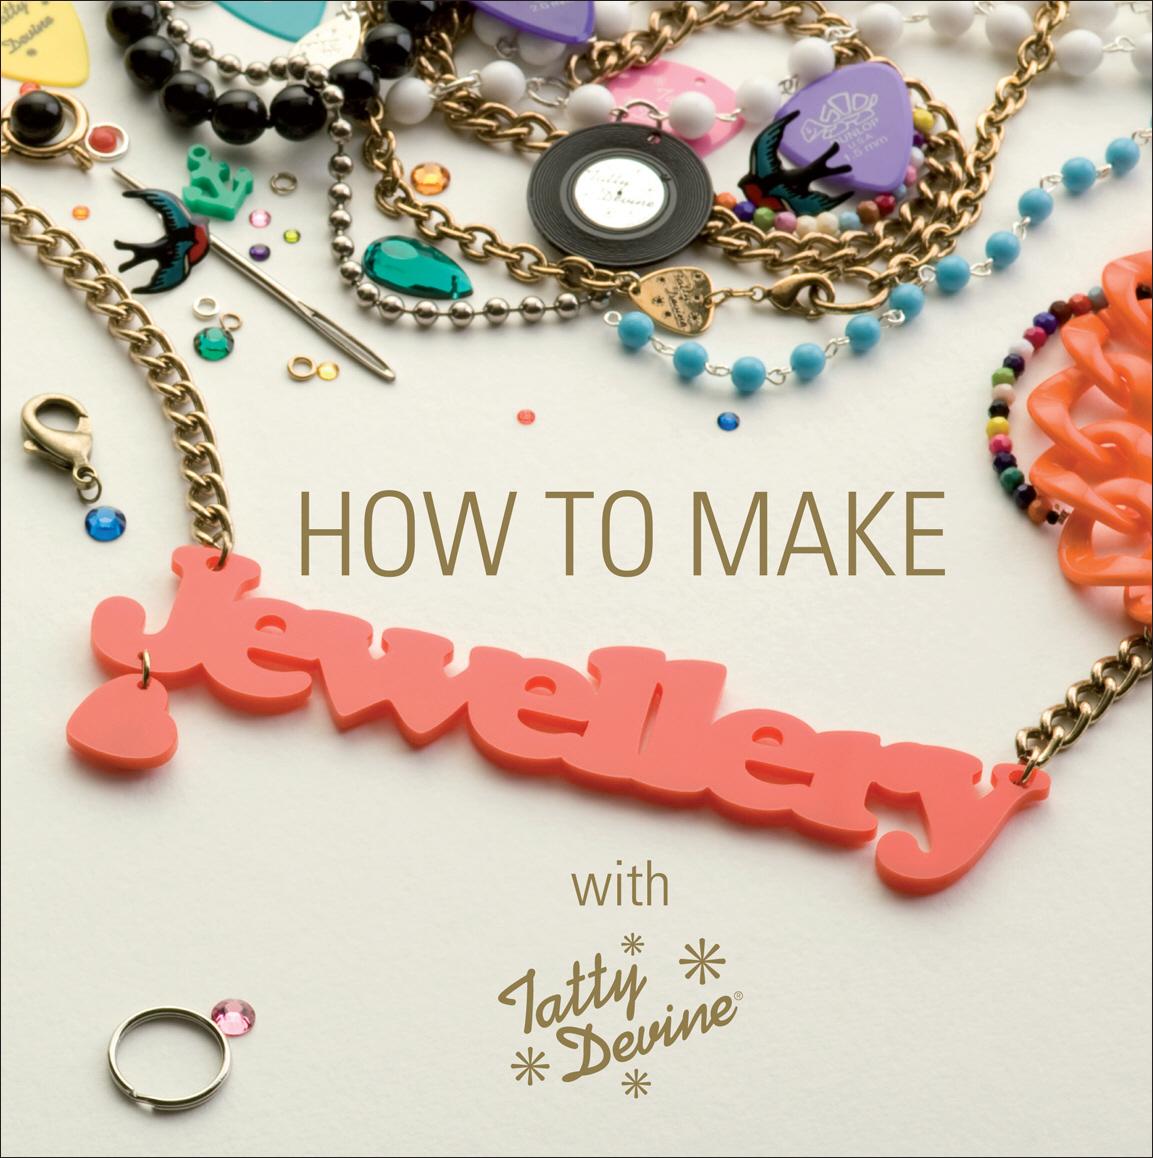 How to Make Jewellery With Tatty Devine vogue the jewellery